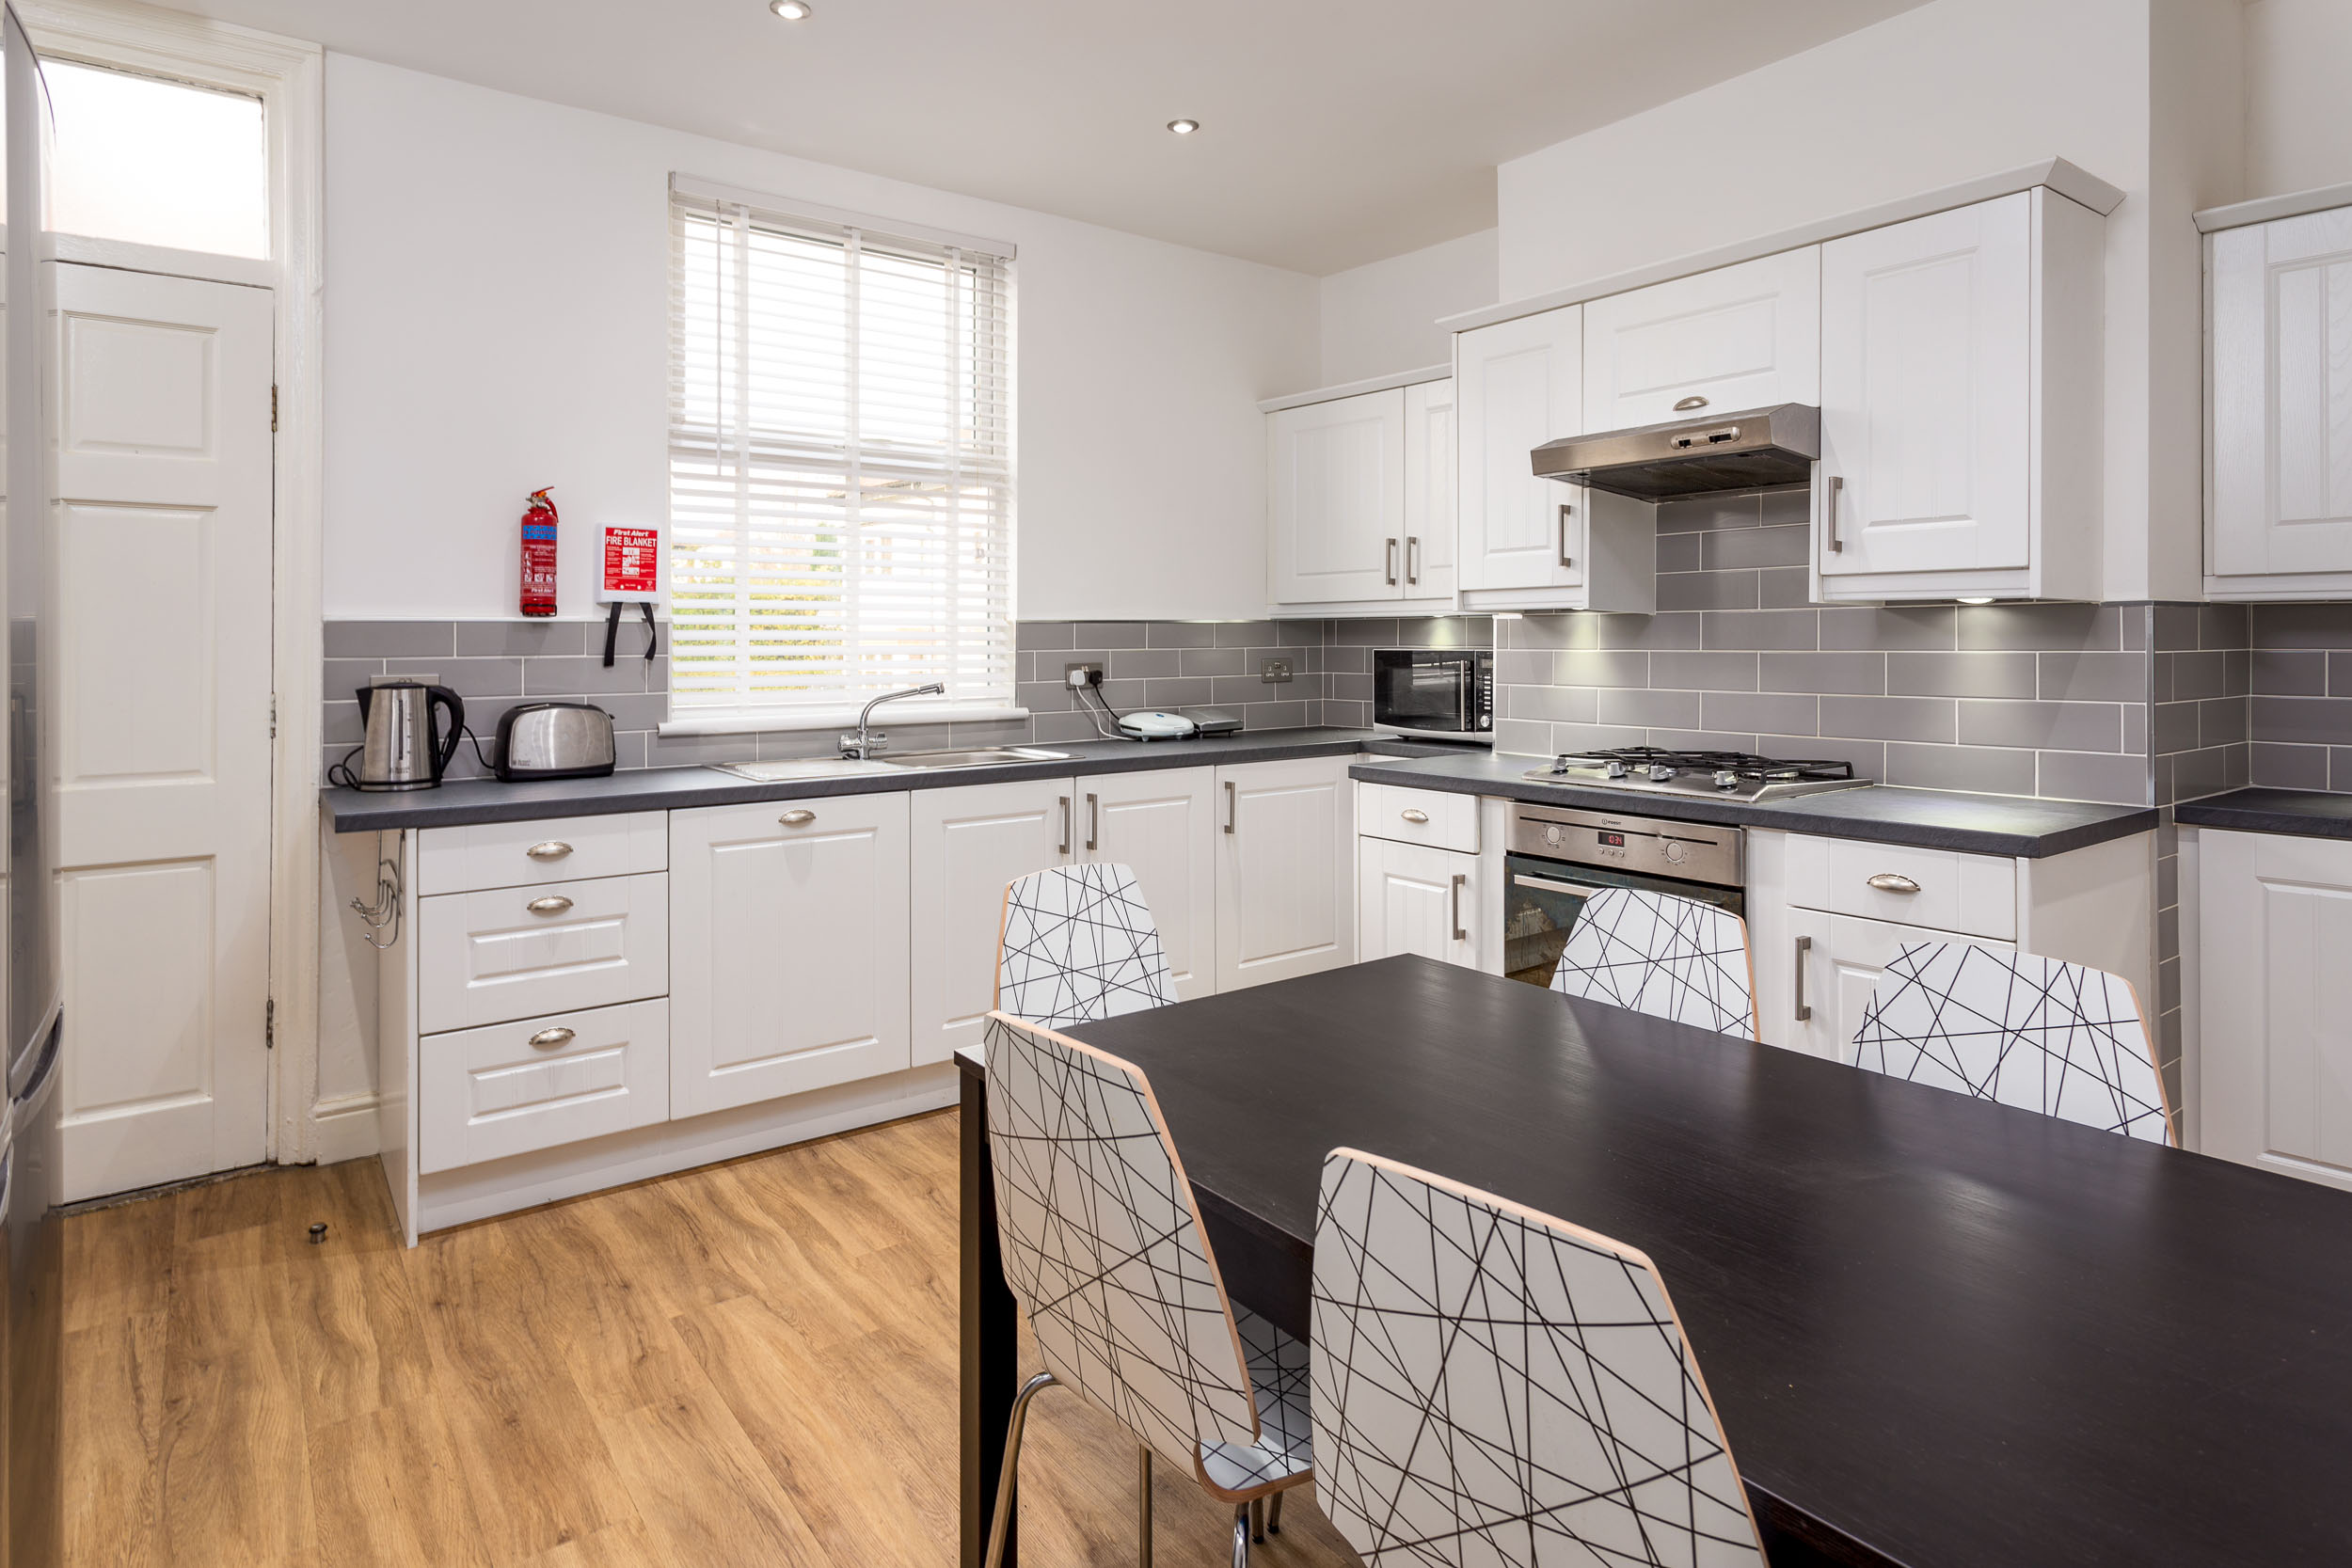 grimthorpe property photography leeds west yorkshire kitchen.jpg